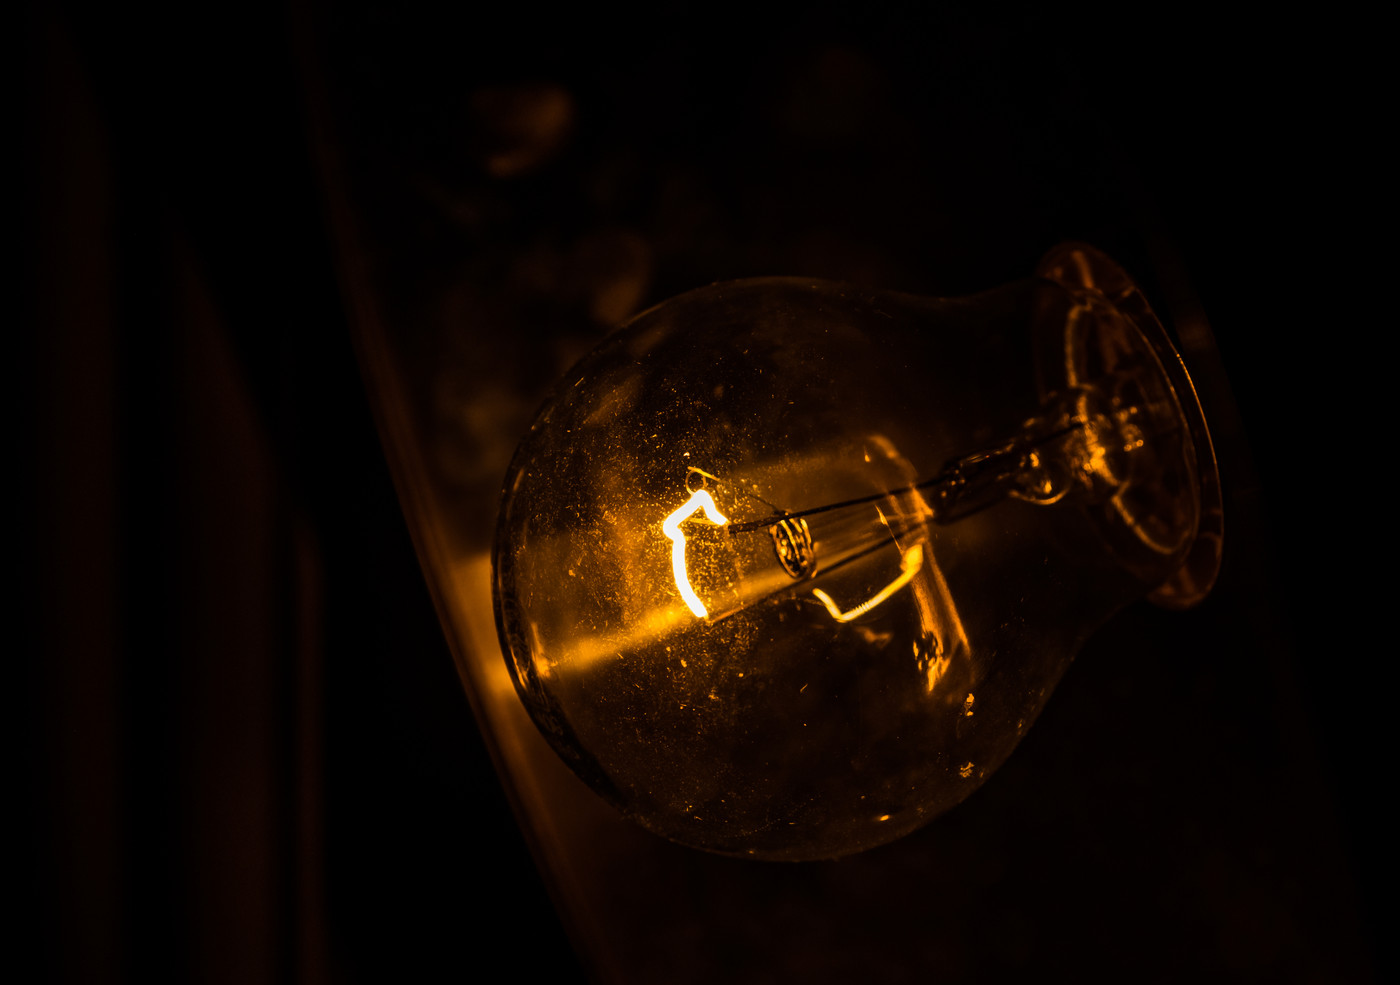 Filament explosion